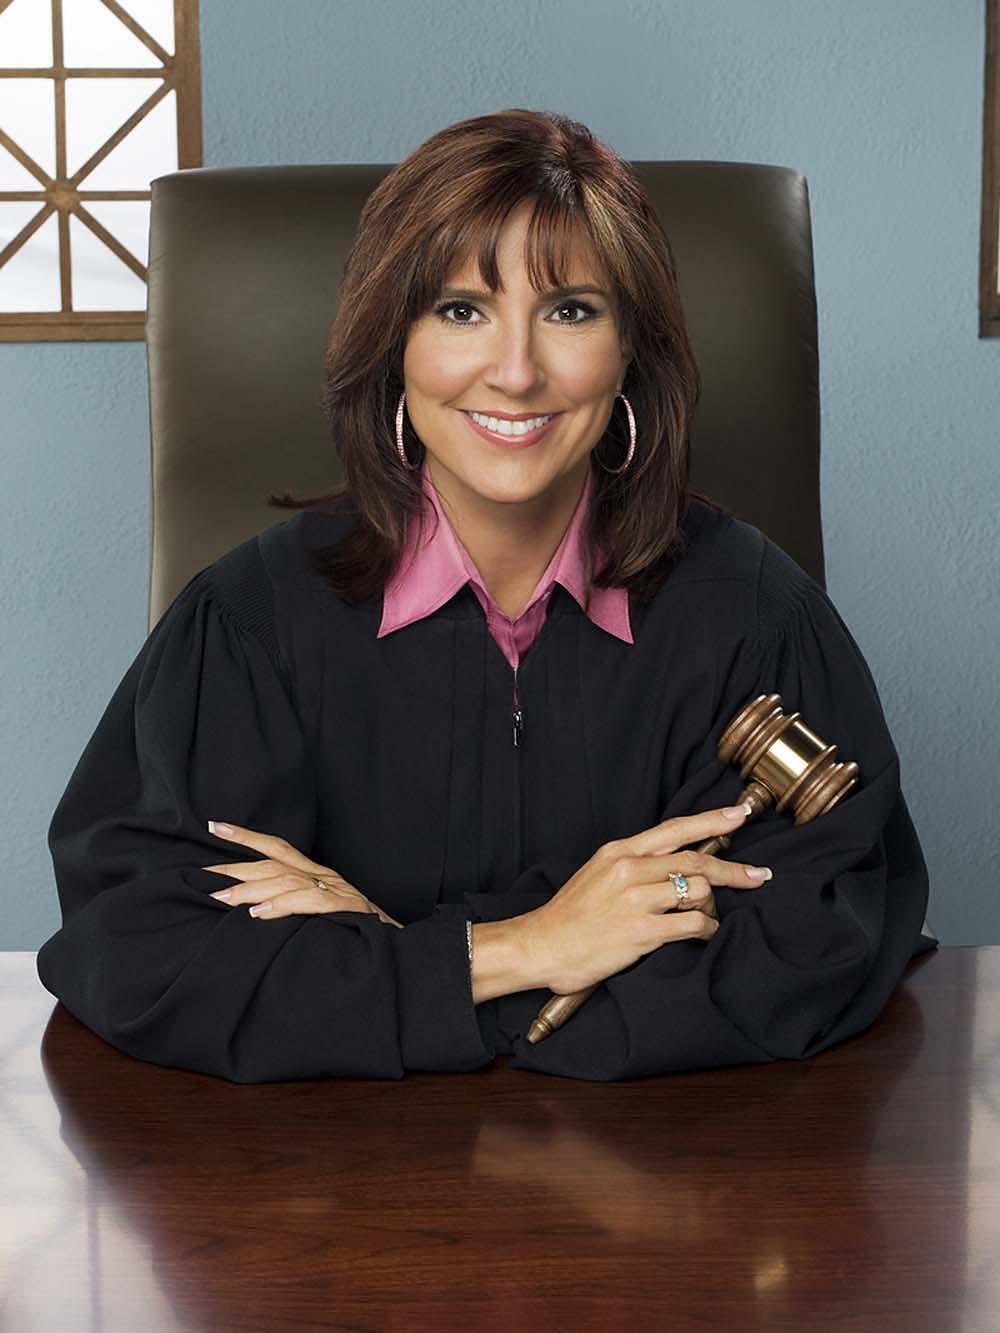 The People S Court Season 11 Judge Marilyn Milian Photo